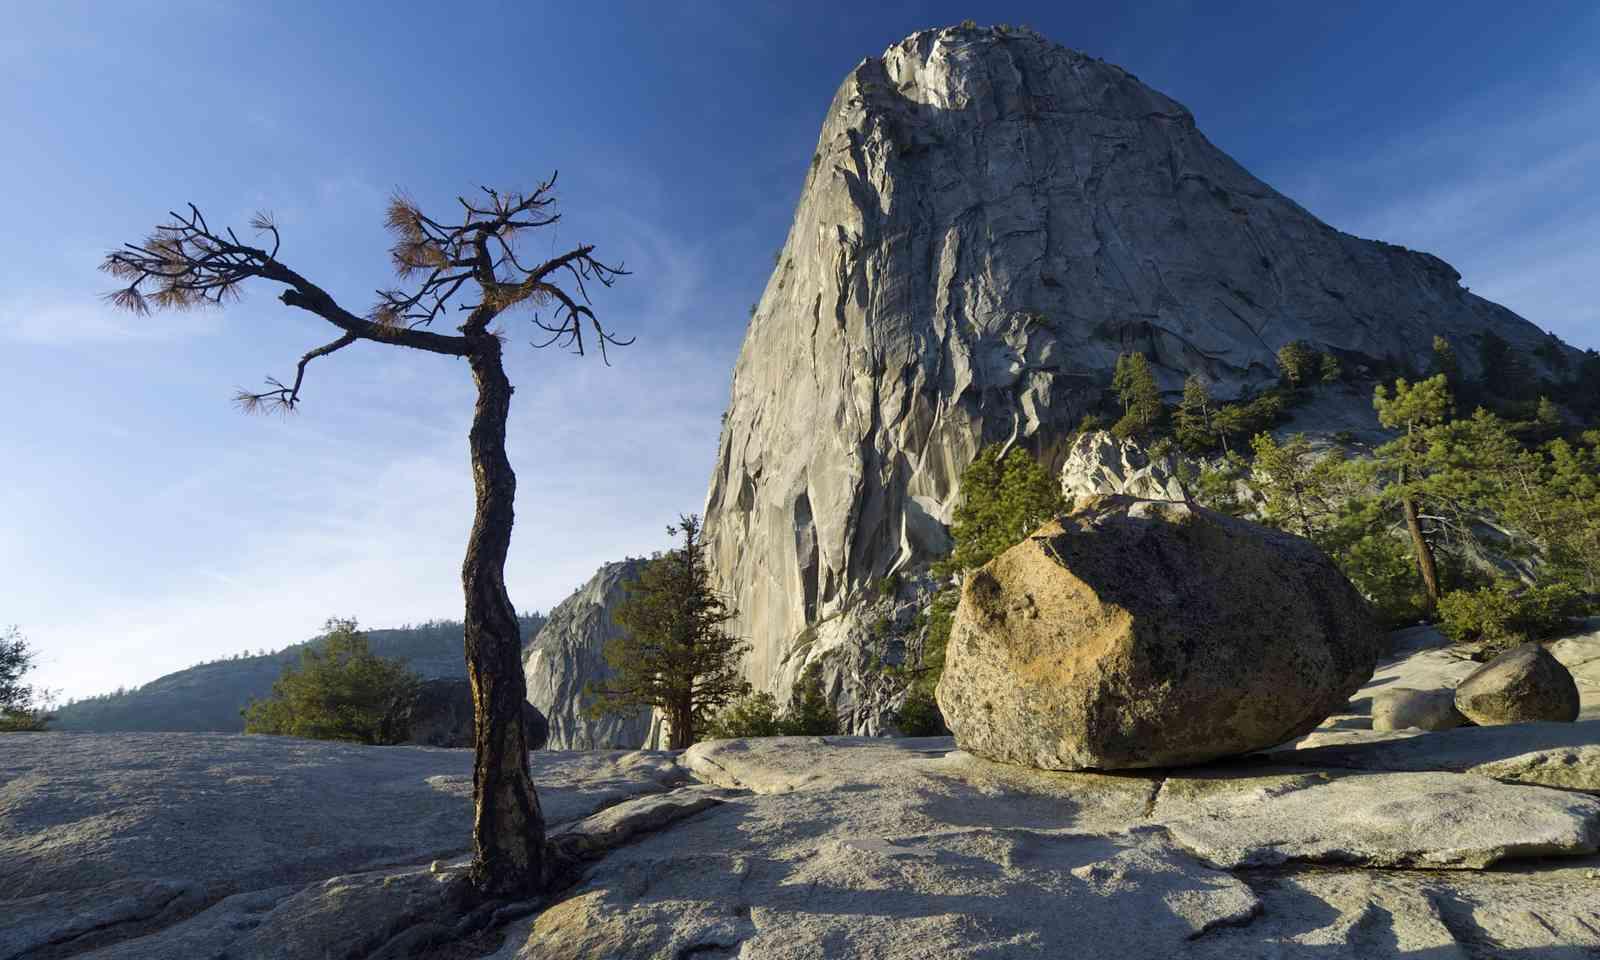 Liberty Cap, Yosemite (Shutterstock.com)